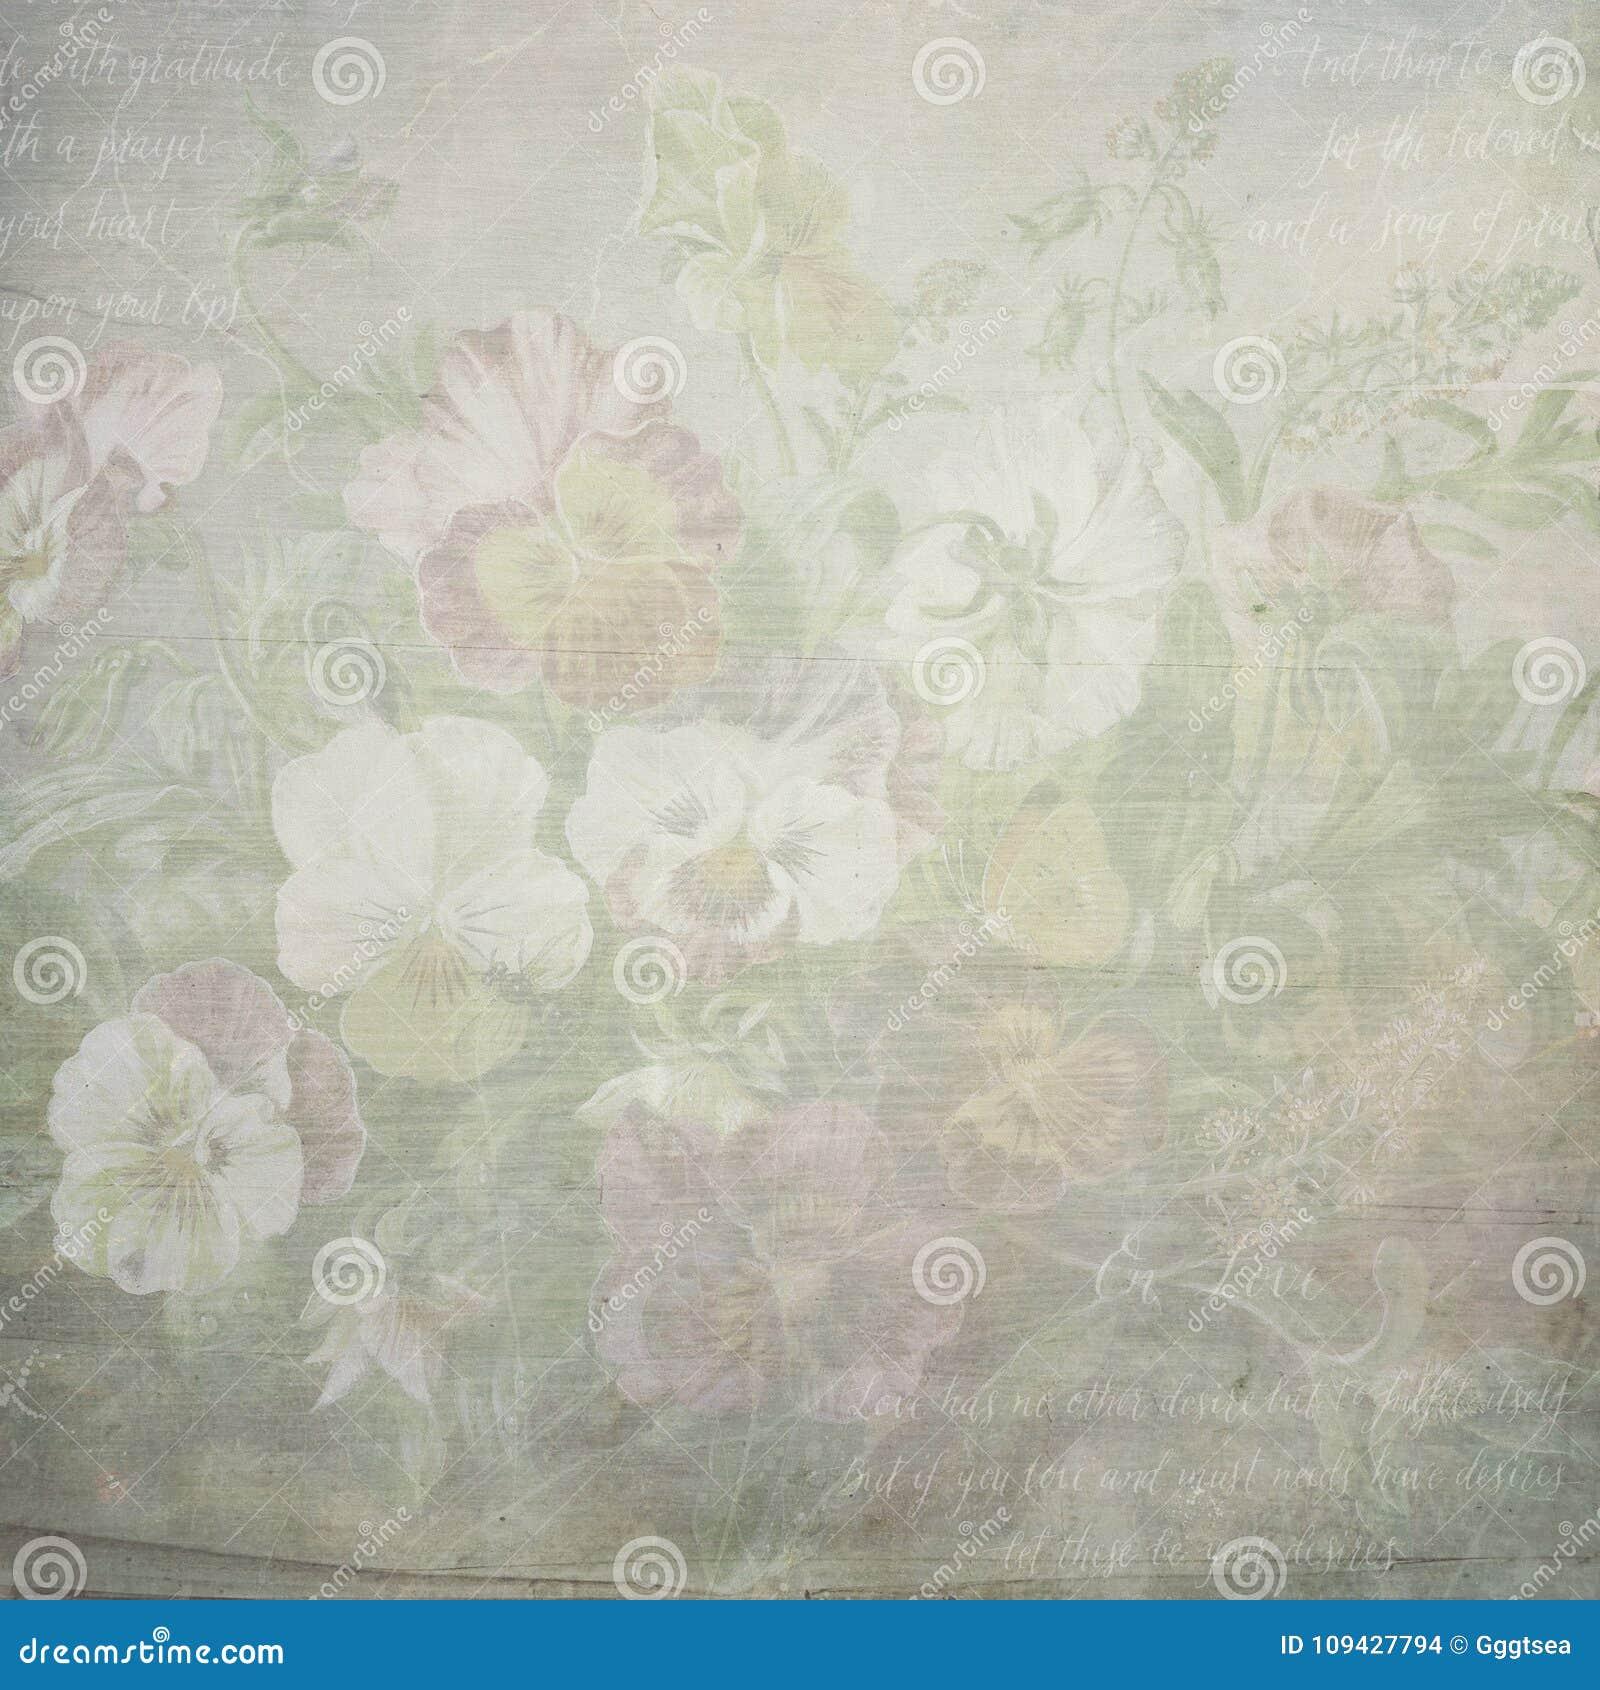 Textura de papel das flores botânicas gastos do vintage